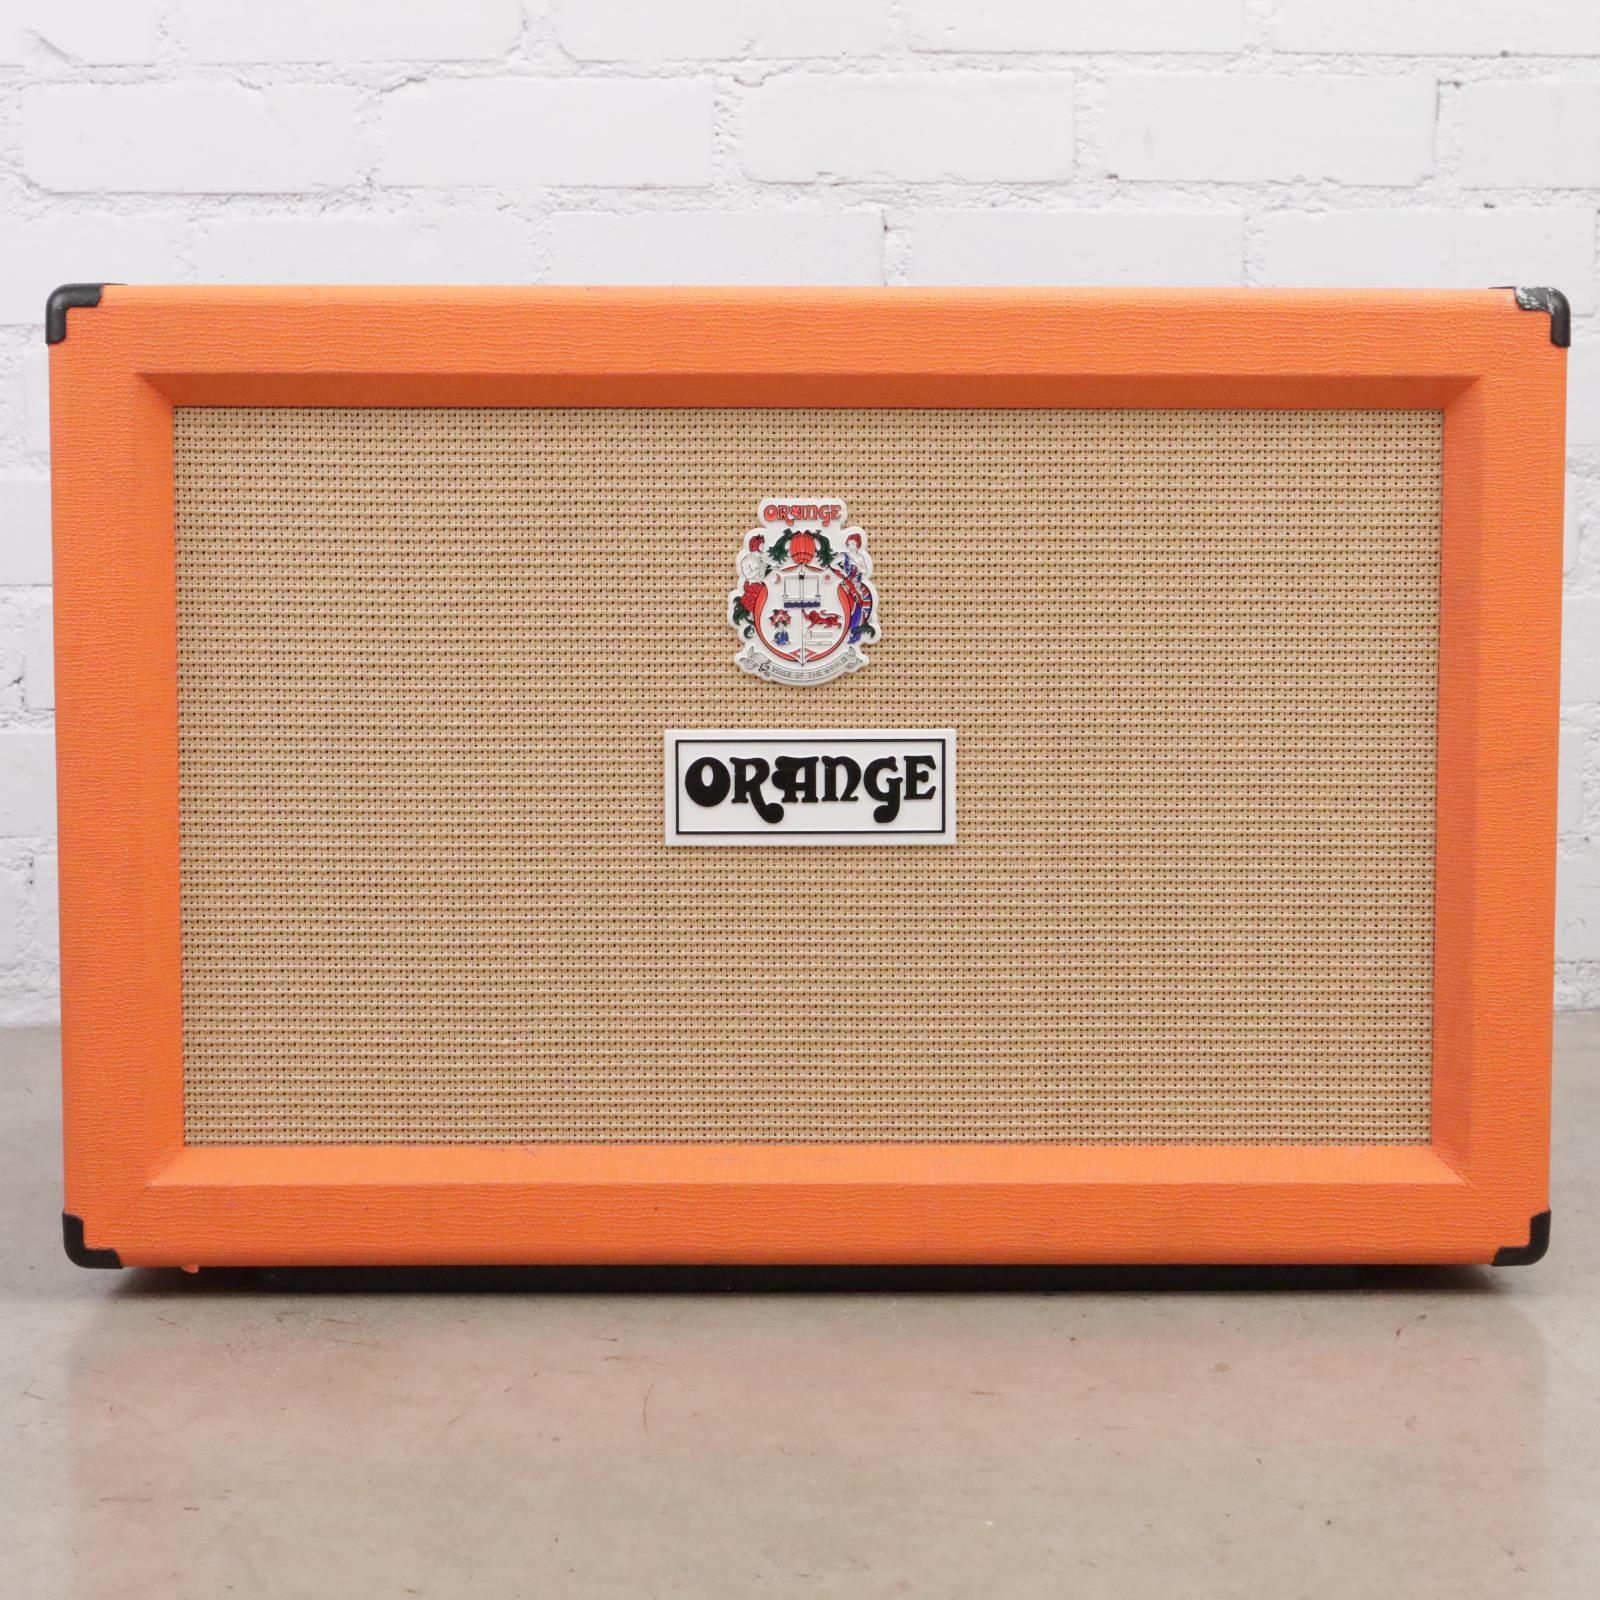 "Orange PPC212 120W 2x12"" Guitar Speaker Cabinet #43979"